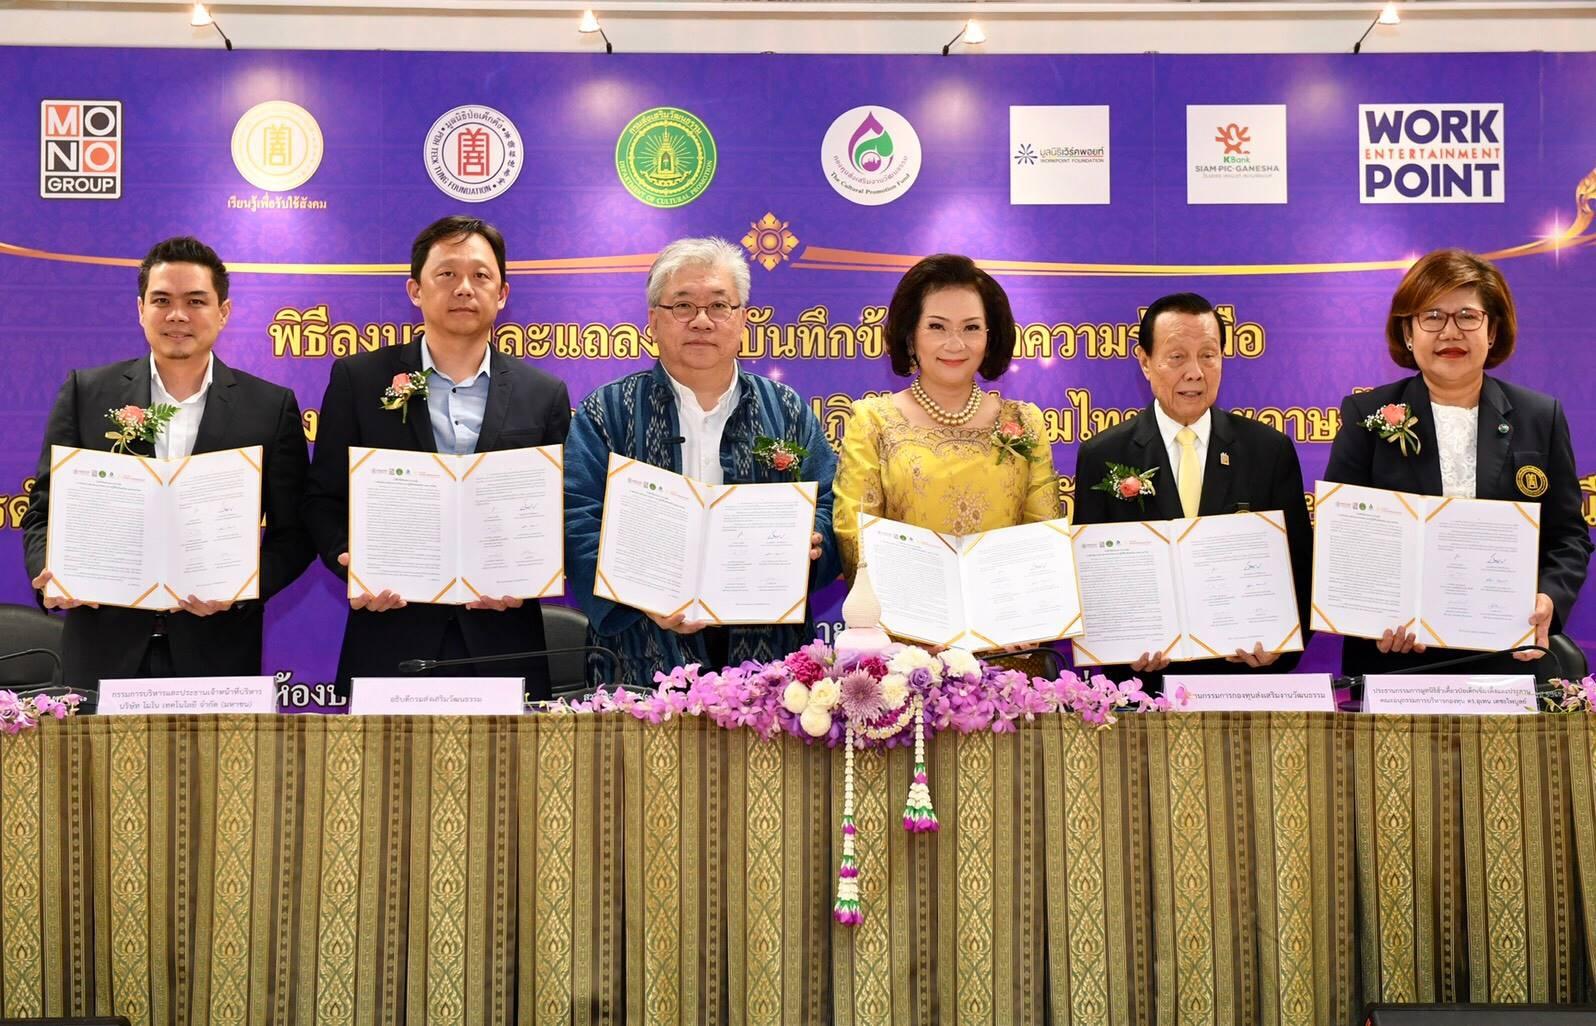 mthai ข่าวสดวันนี้ ภาษาไทย มารยาทไทย